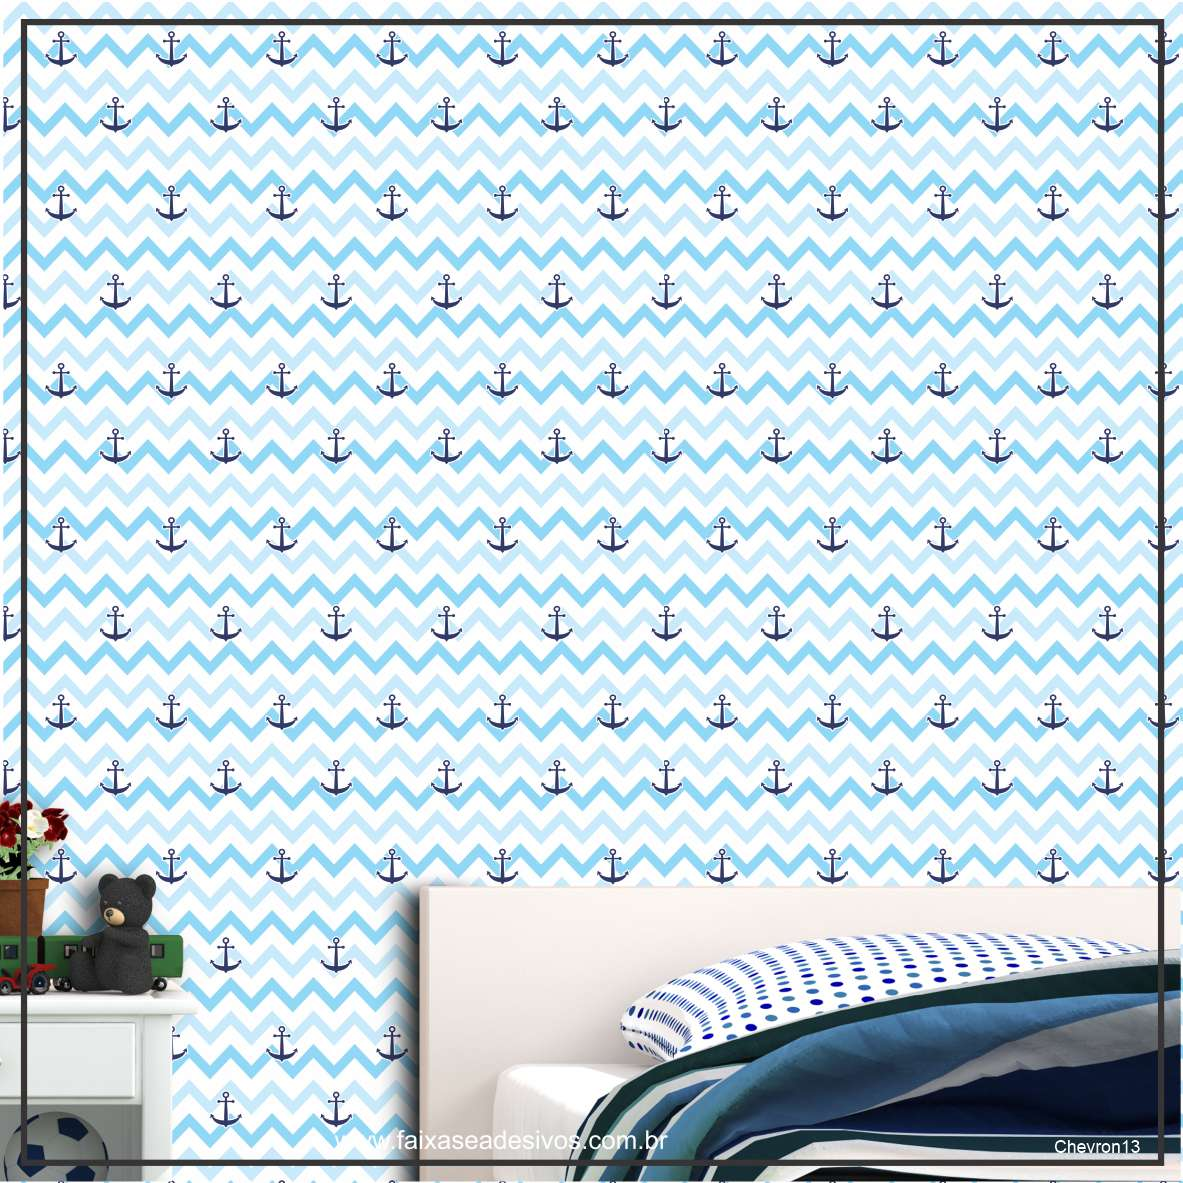 012 - Adesivo Decorativo de parede Chevron ancora - 58cm larg  - Fac Signs